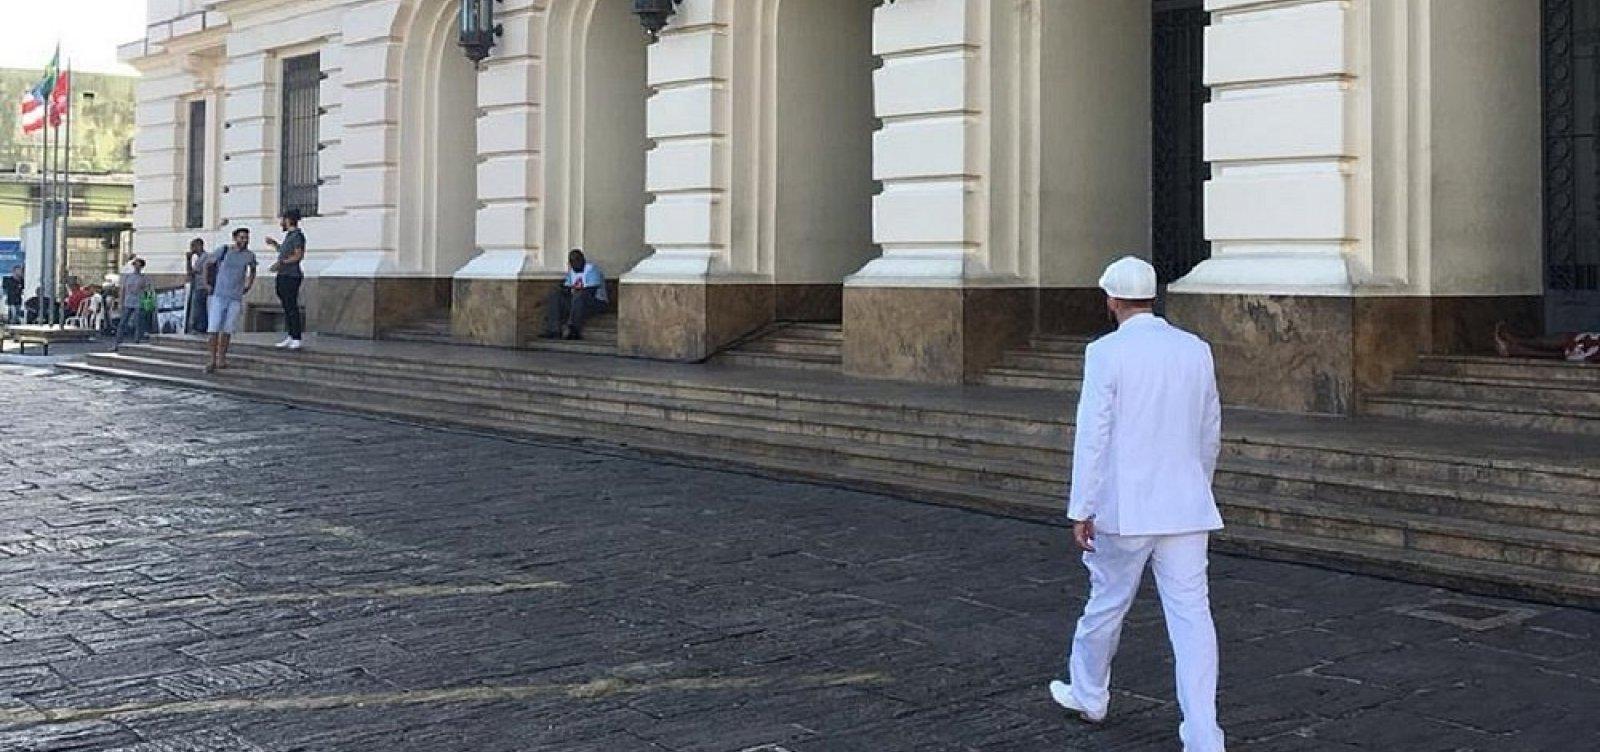 [Após advogado ser barrado, OAB pedirá que fóruns permitam uso de traje religioso]